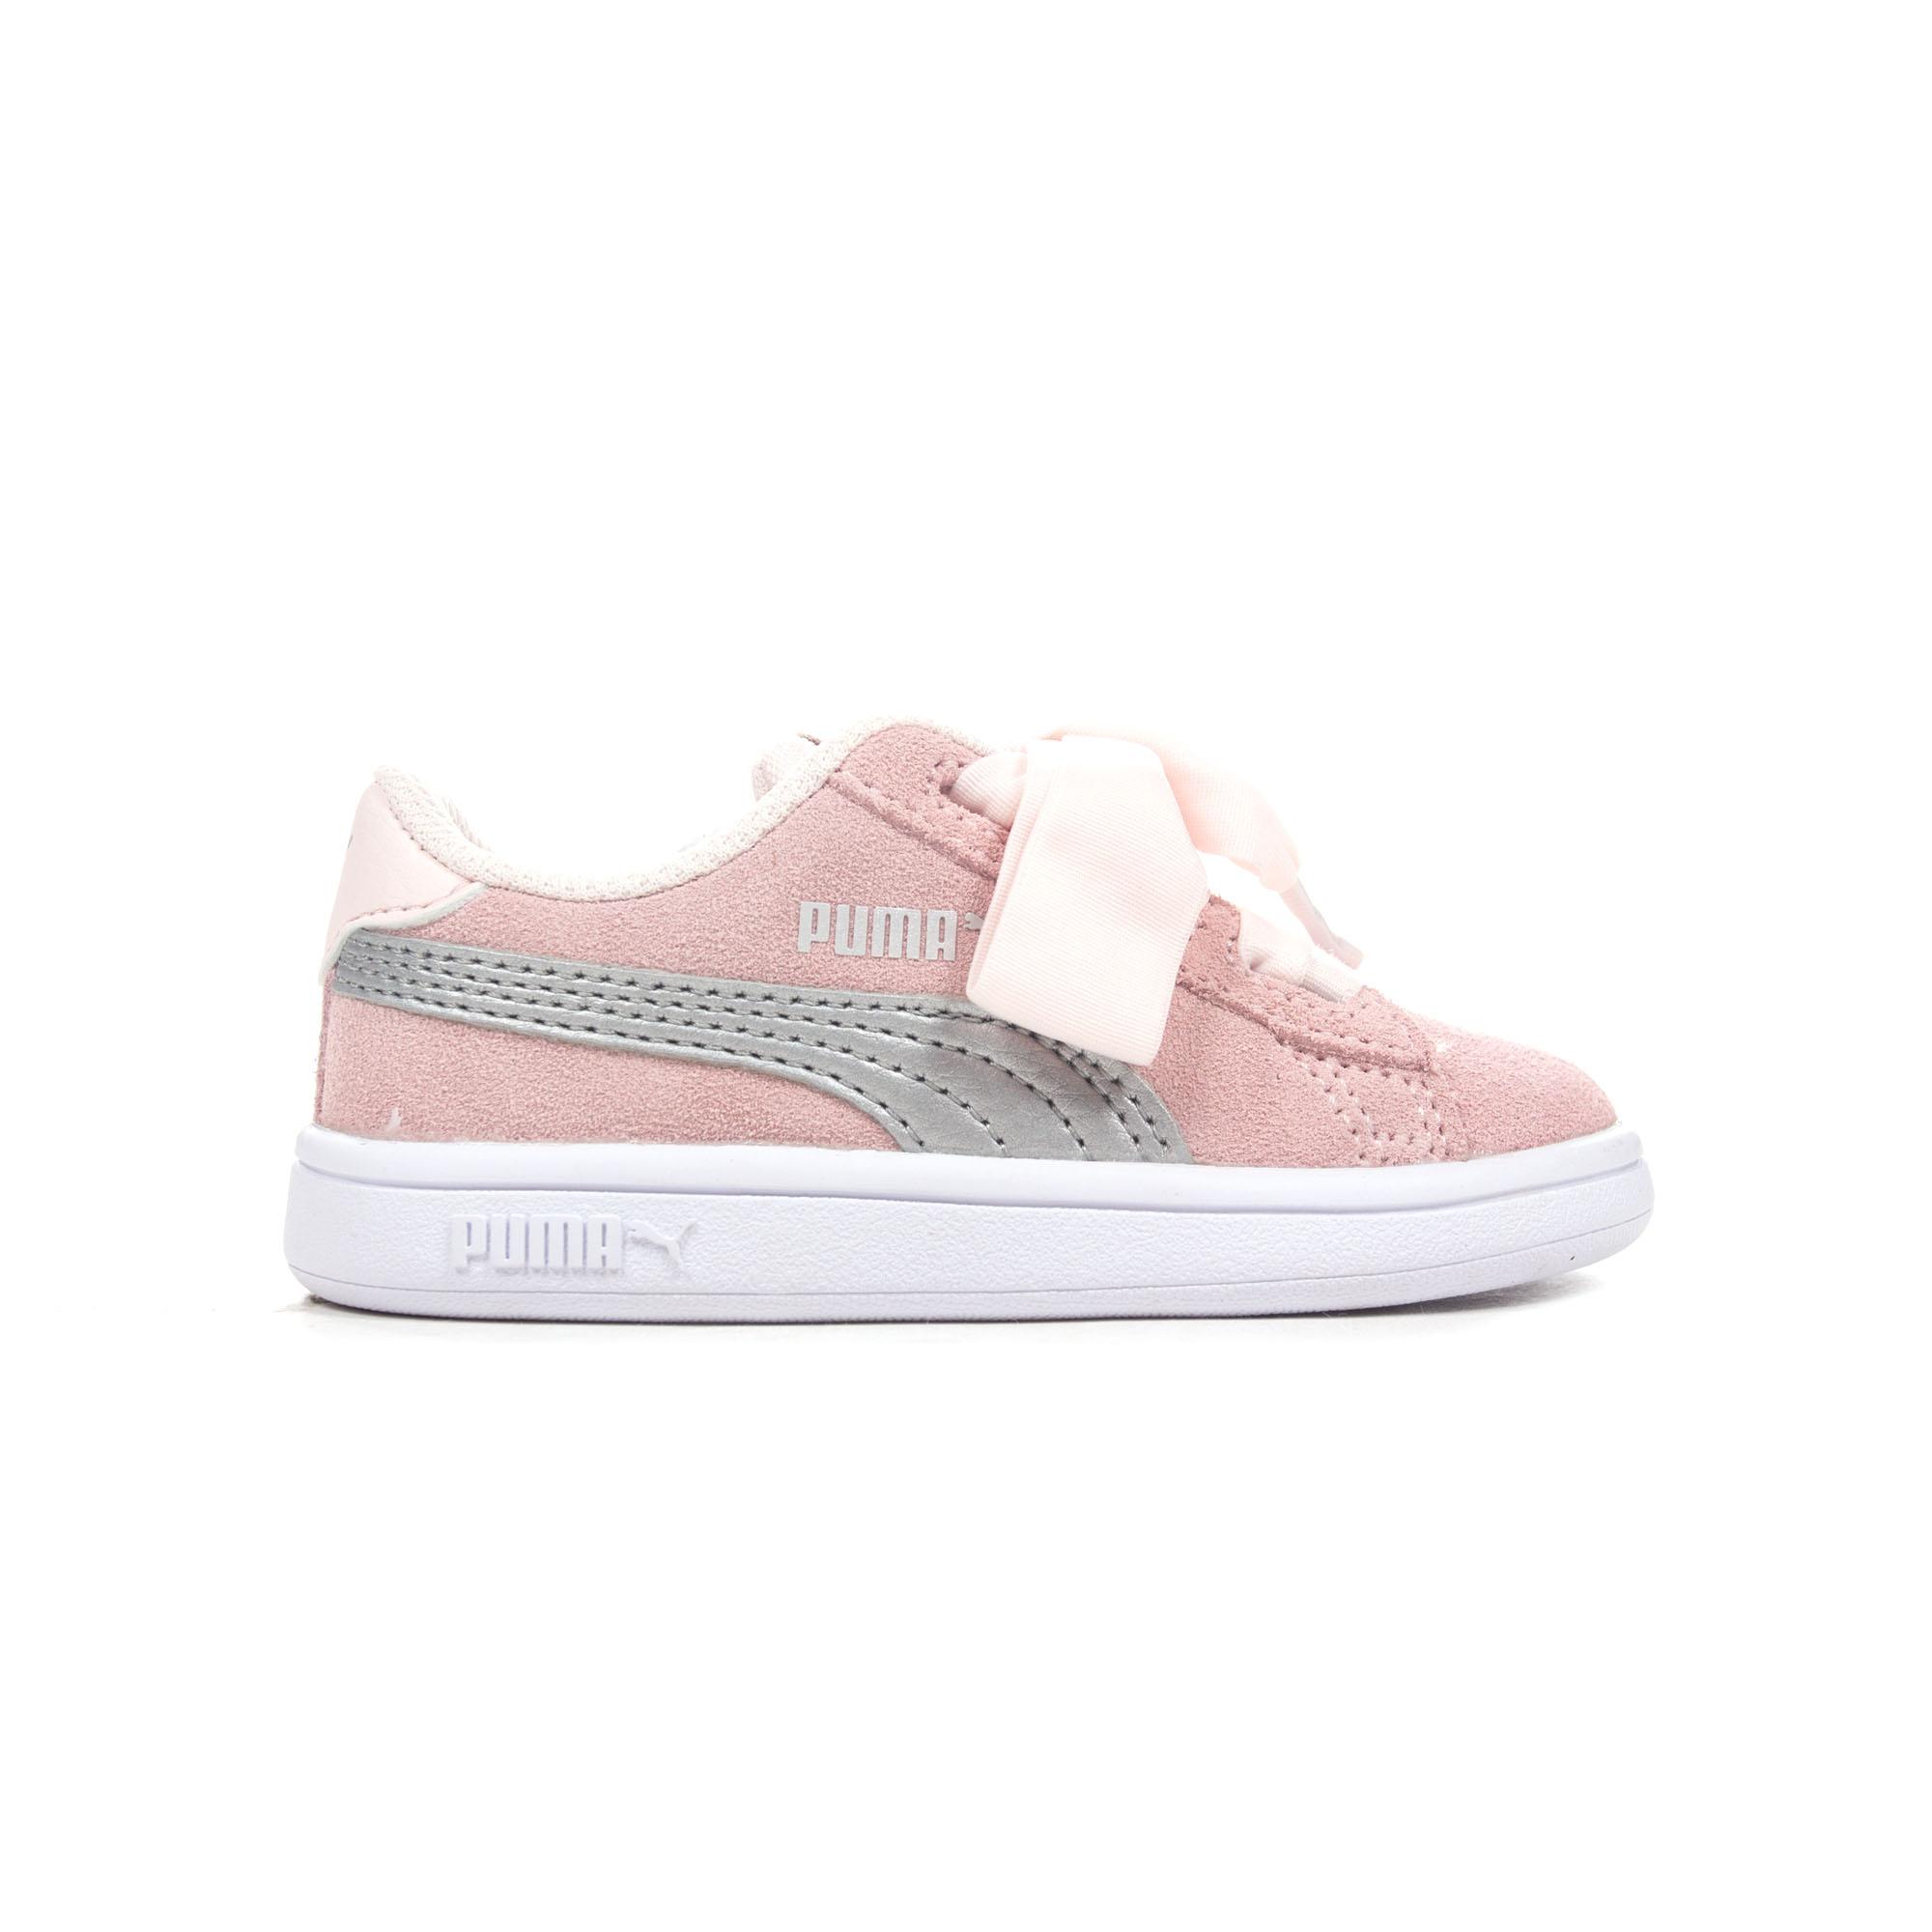 Details about Puma Smash V2 Ribbon Suede Infant Girls Trainer Shoe  Pearl Silver - UK 9 1237dee98